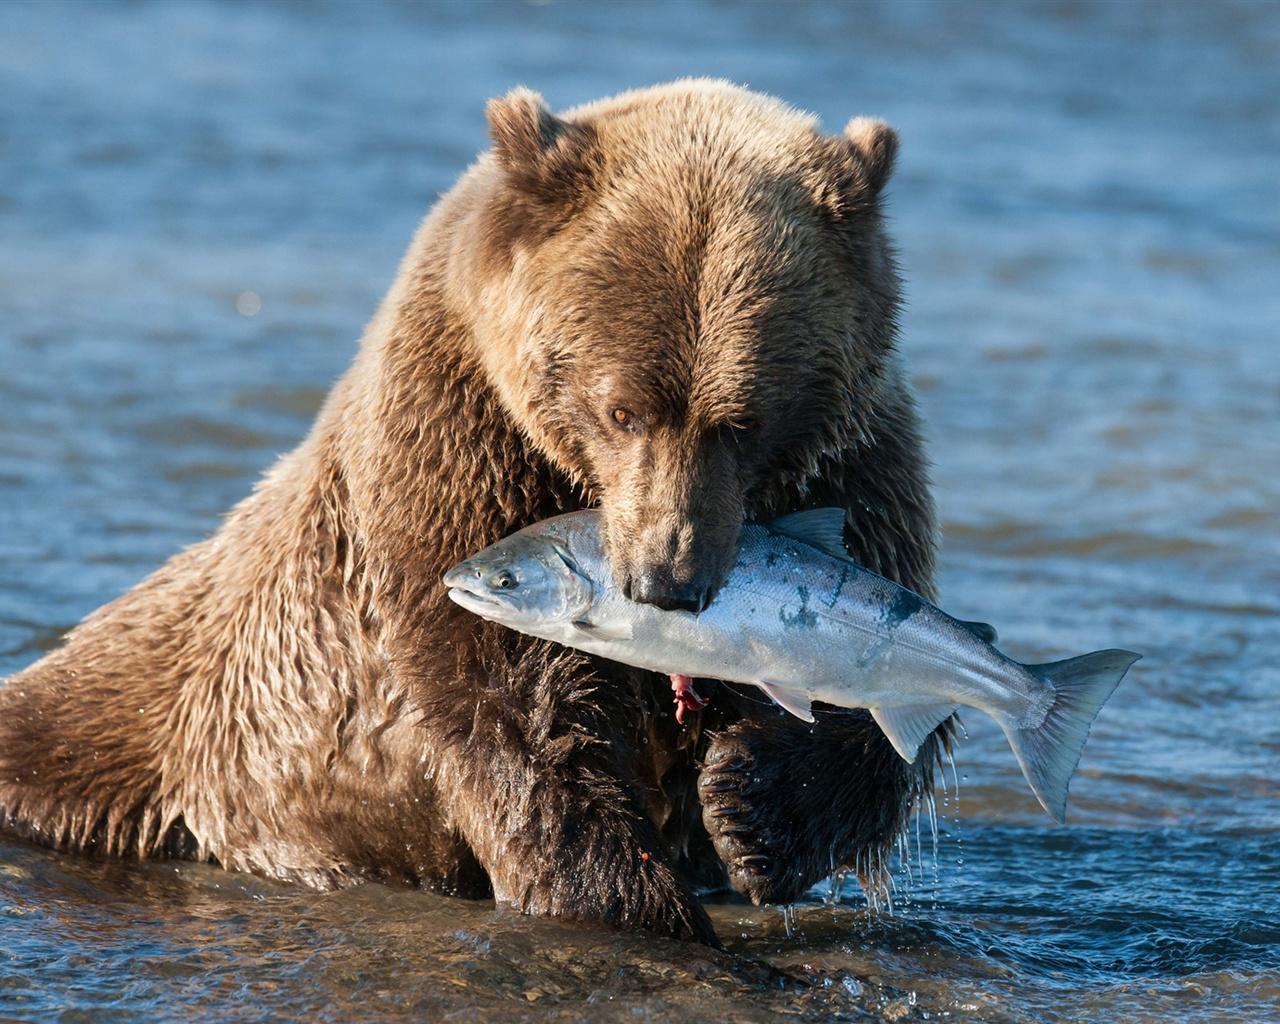 Cute Fish Wallpaper Hd Wallpaper Brown Bear Catching A Fish 1920x1200 Hd Picture